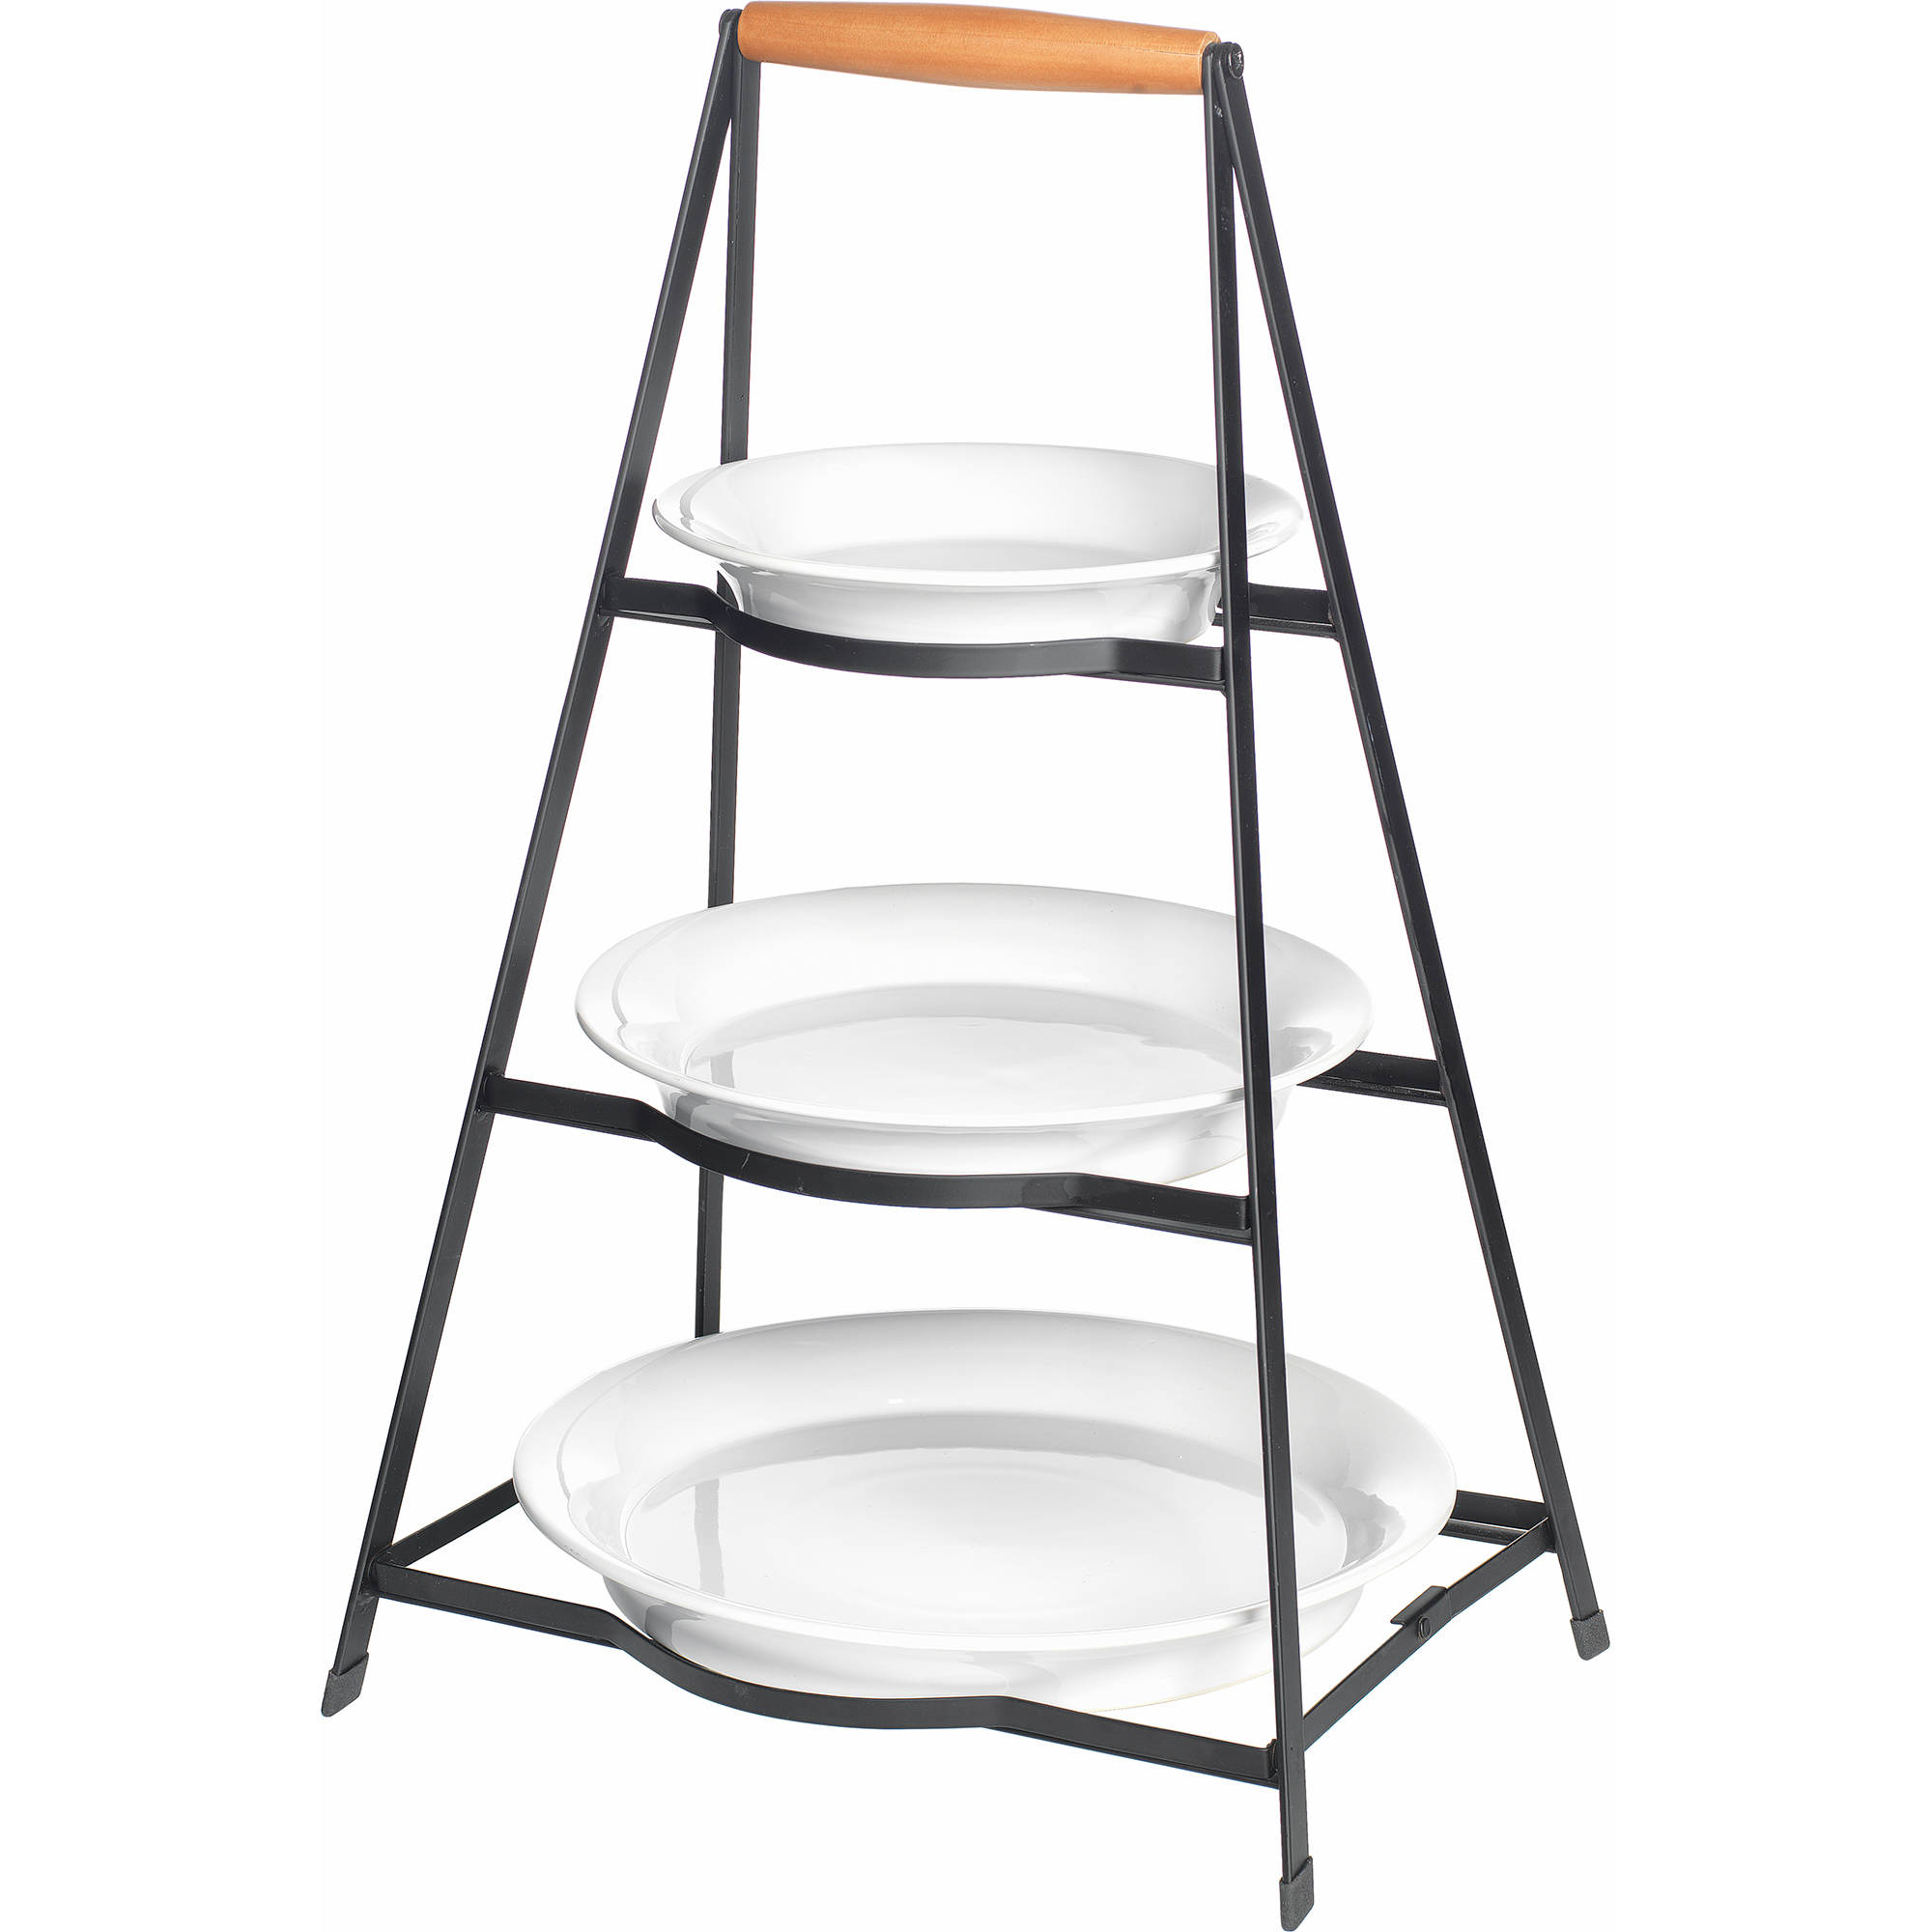 Groovy Berkley Jensen 3 Tier Collapsible Server With Plates Cjindustries Chair Design For Home Cjindustriesco